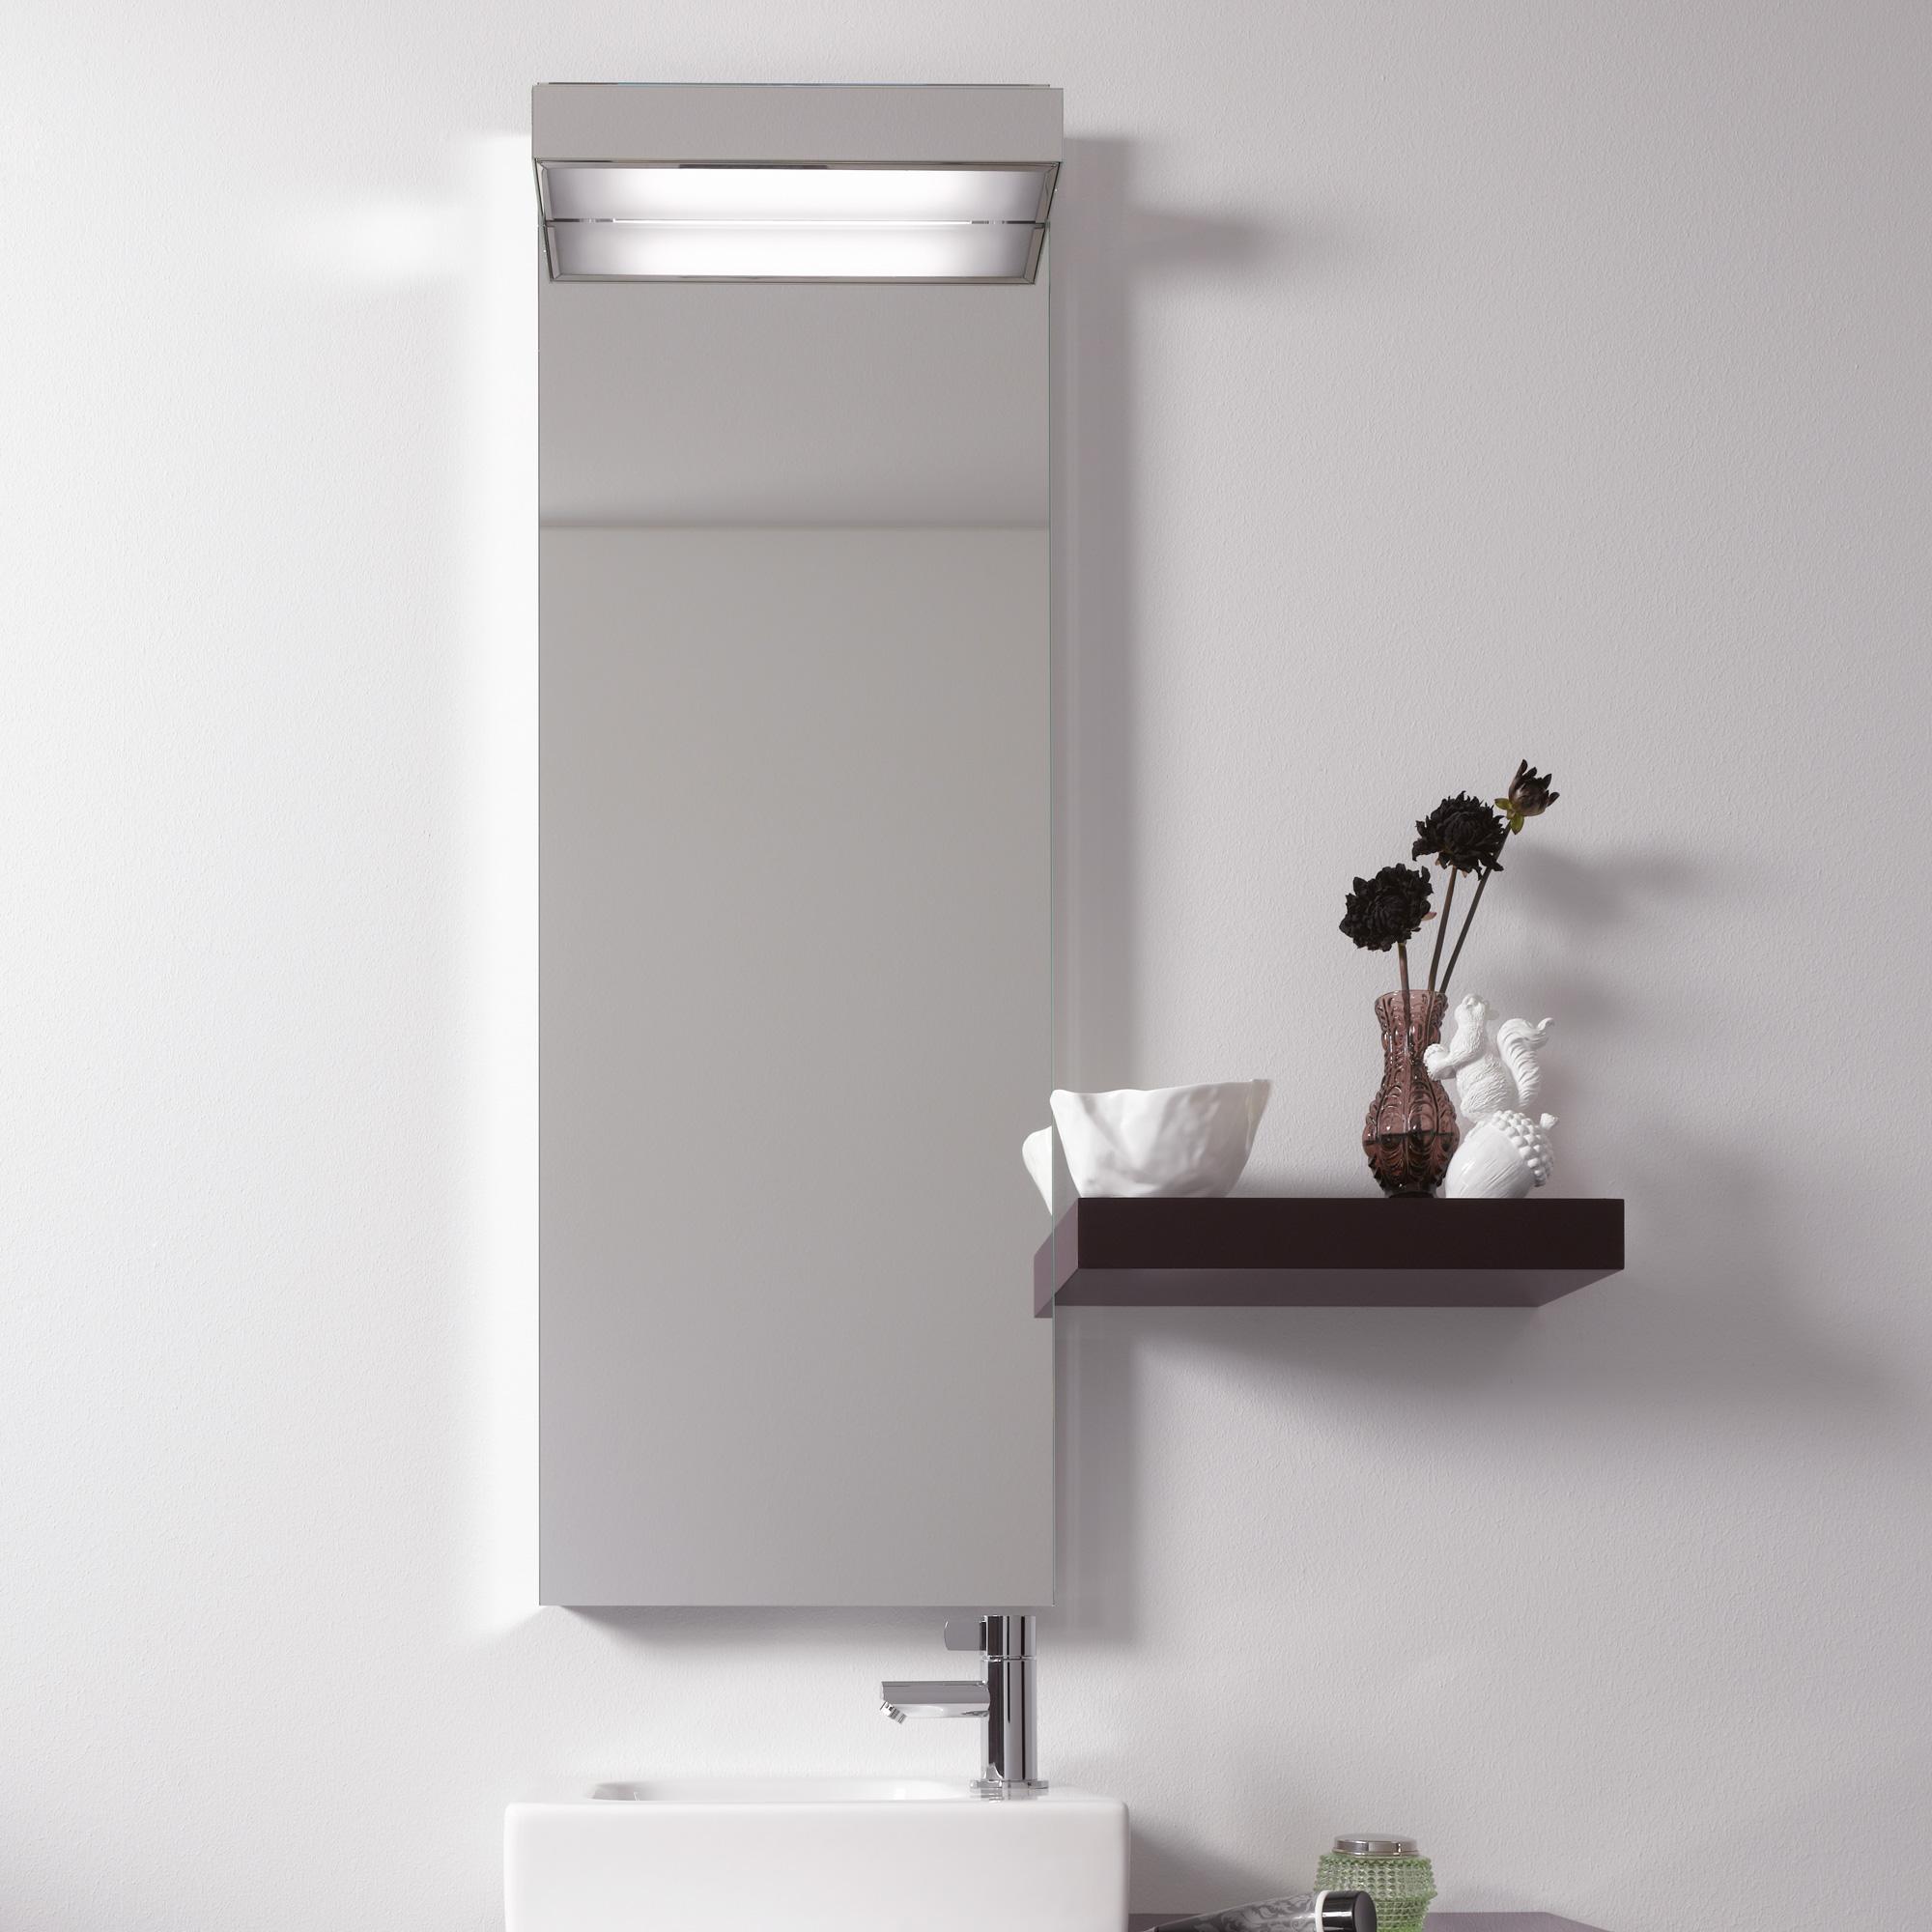 keramag icon xs lichtspiegelelement 840537000 reuter onlineshop. Black Bedroom Furniture Sets. Home Design Ideas